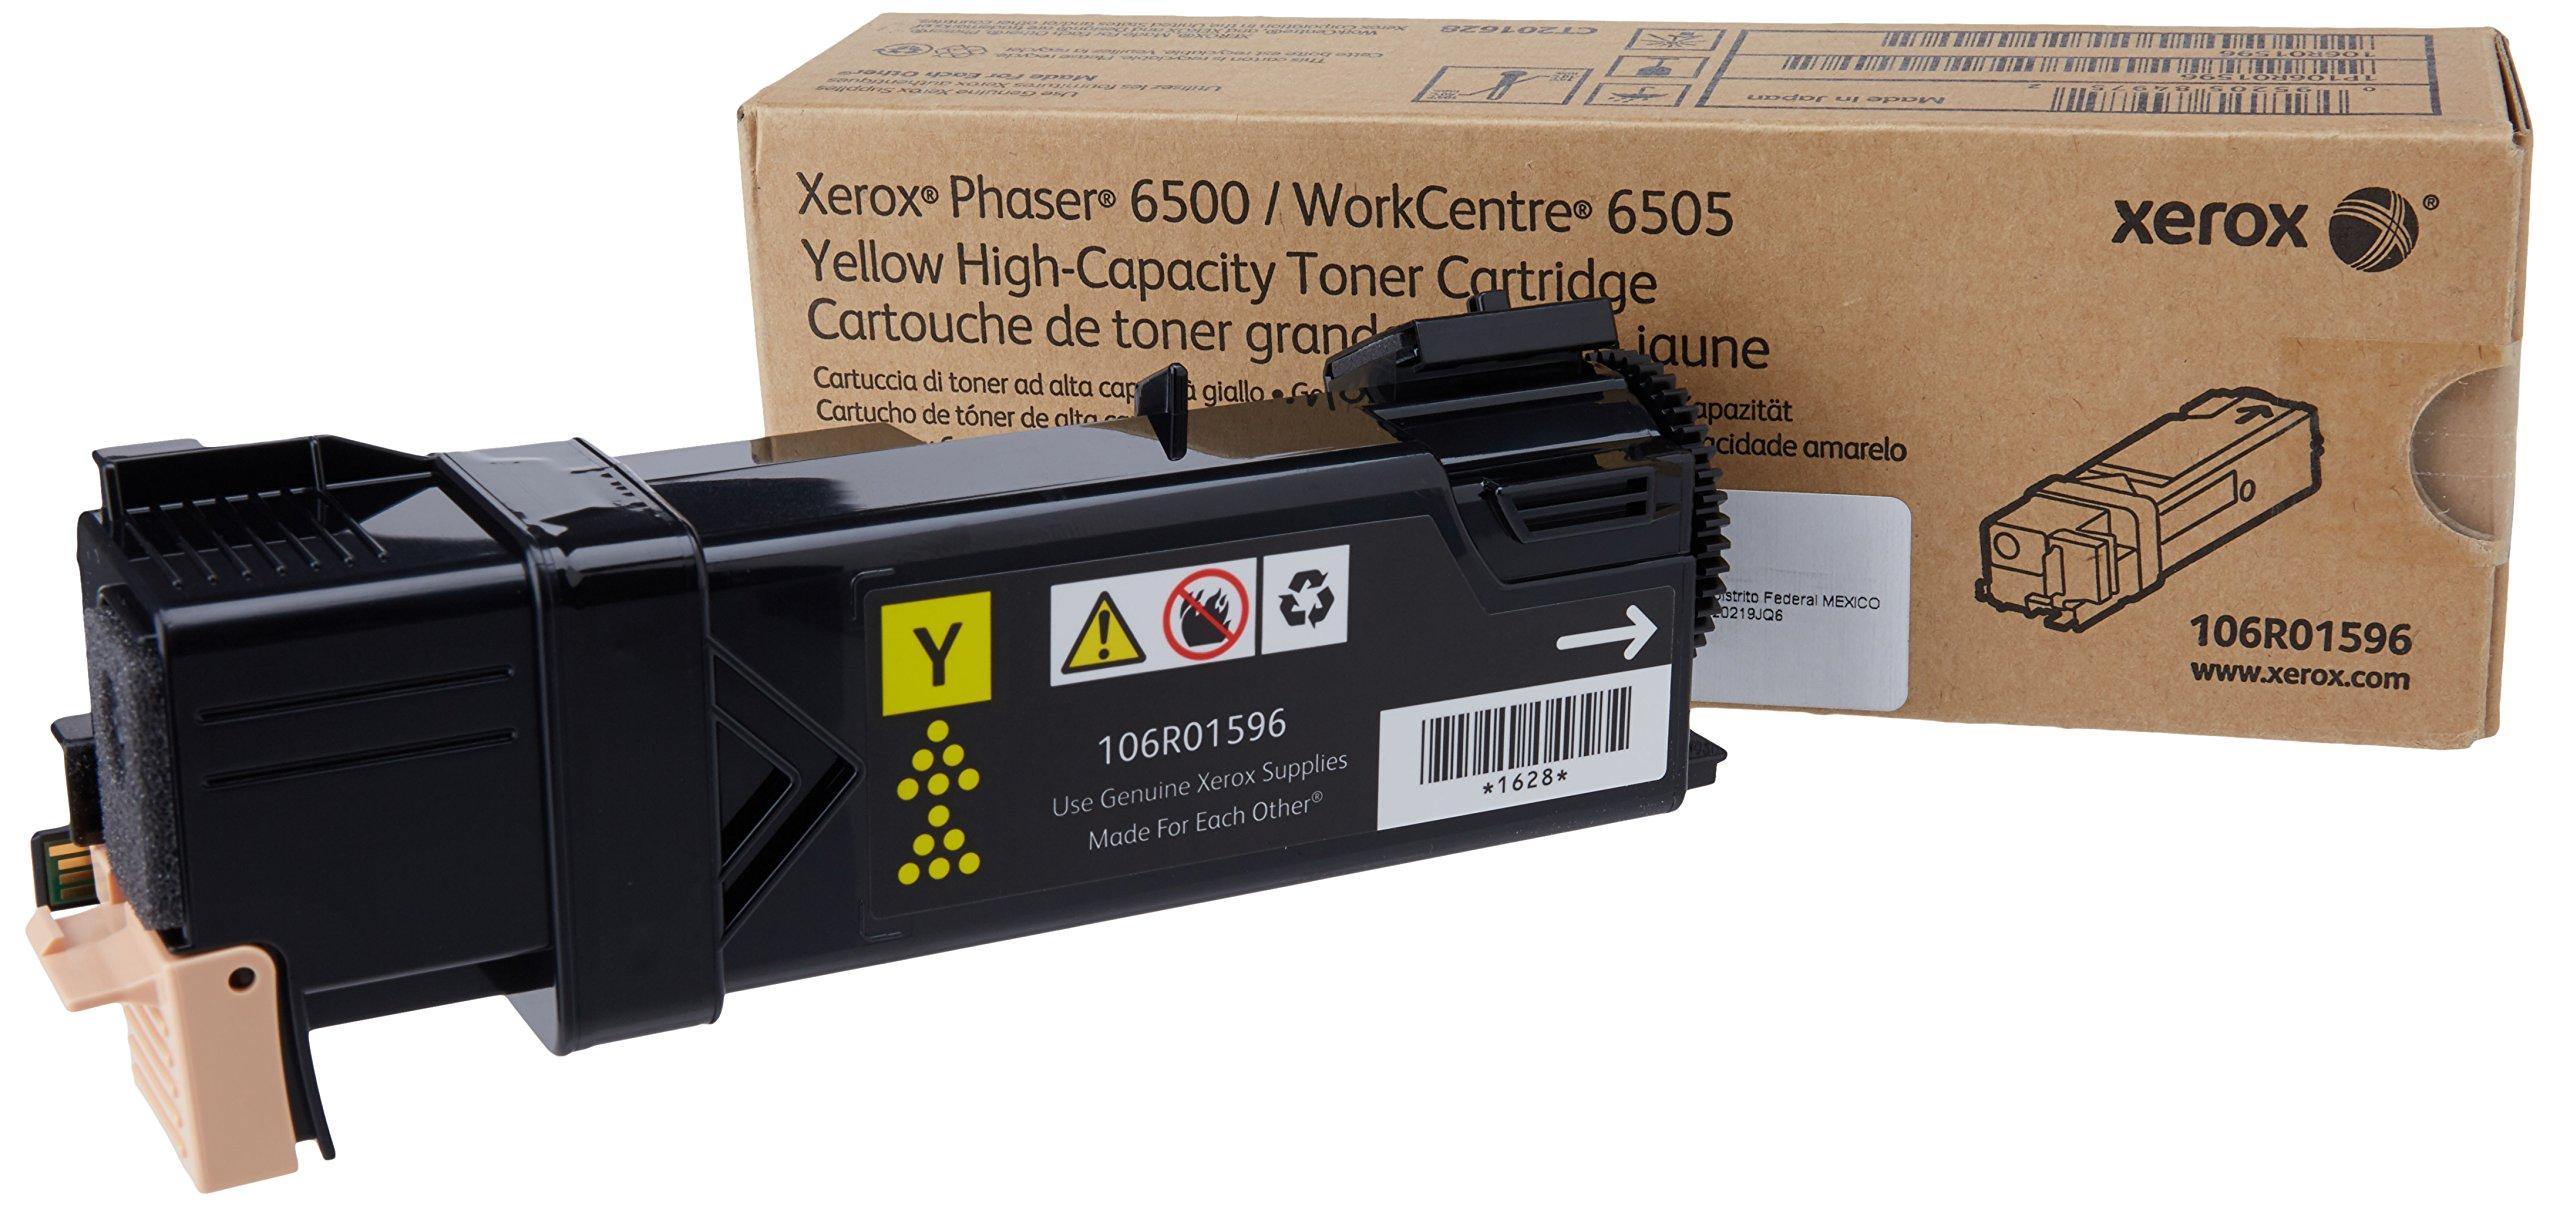 XEROX 106R01596 Yellow High Capacity Toner Cartridge FOR Phaser 6500/WC 6505